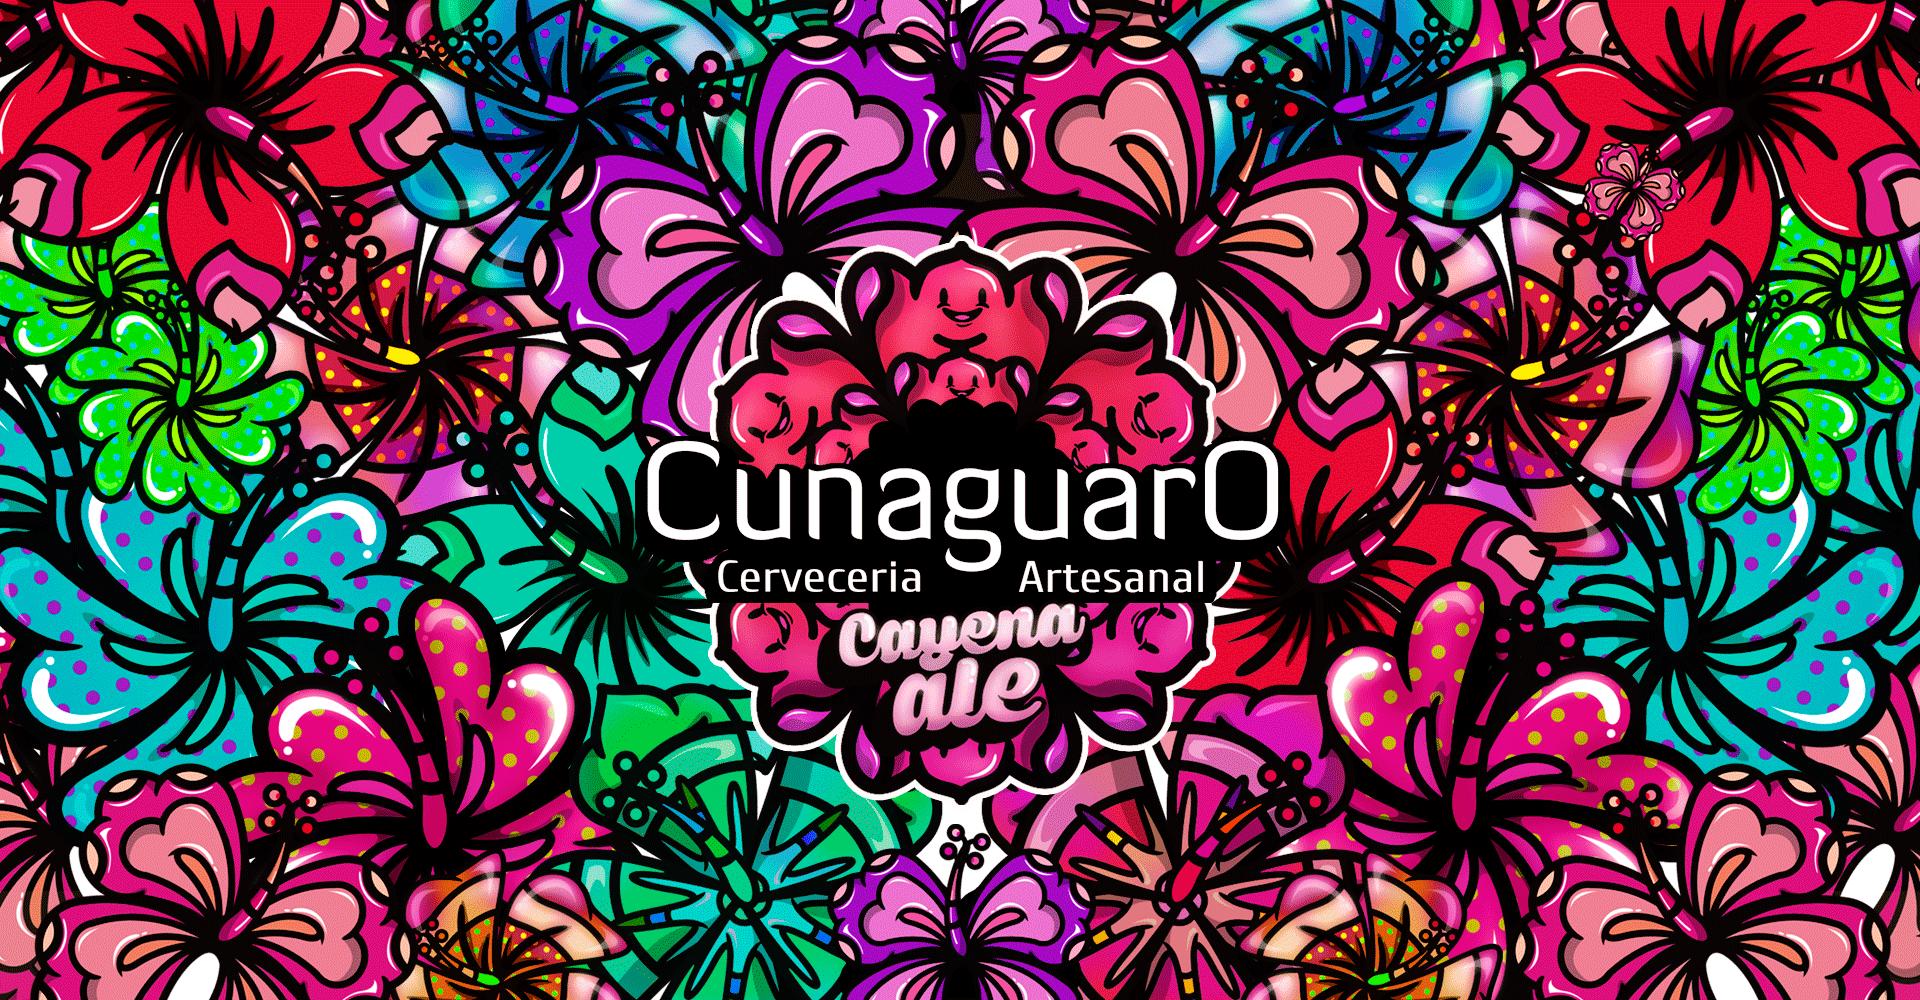 cunaguaro-beer-chocotoy-4.png